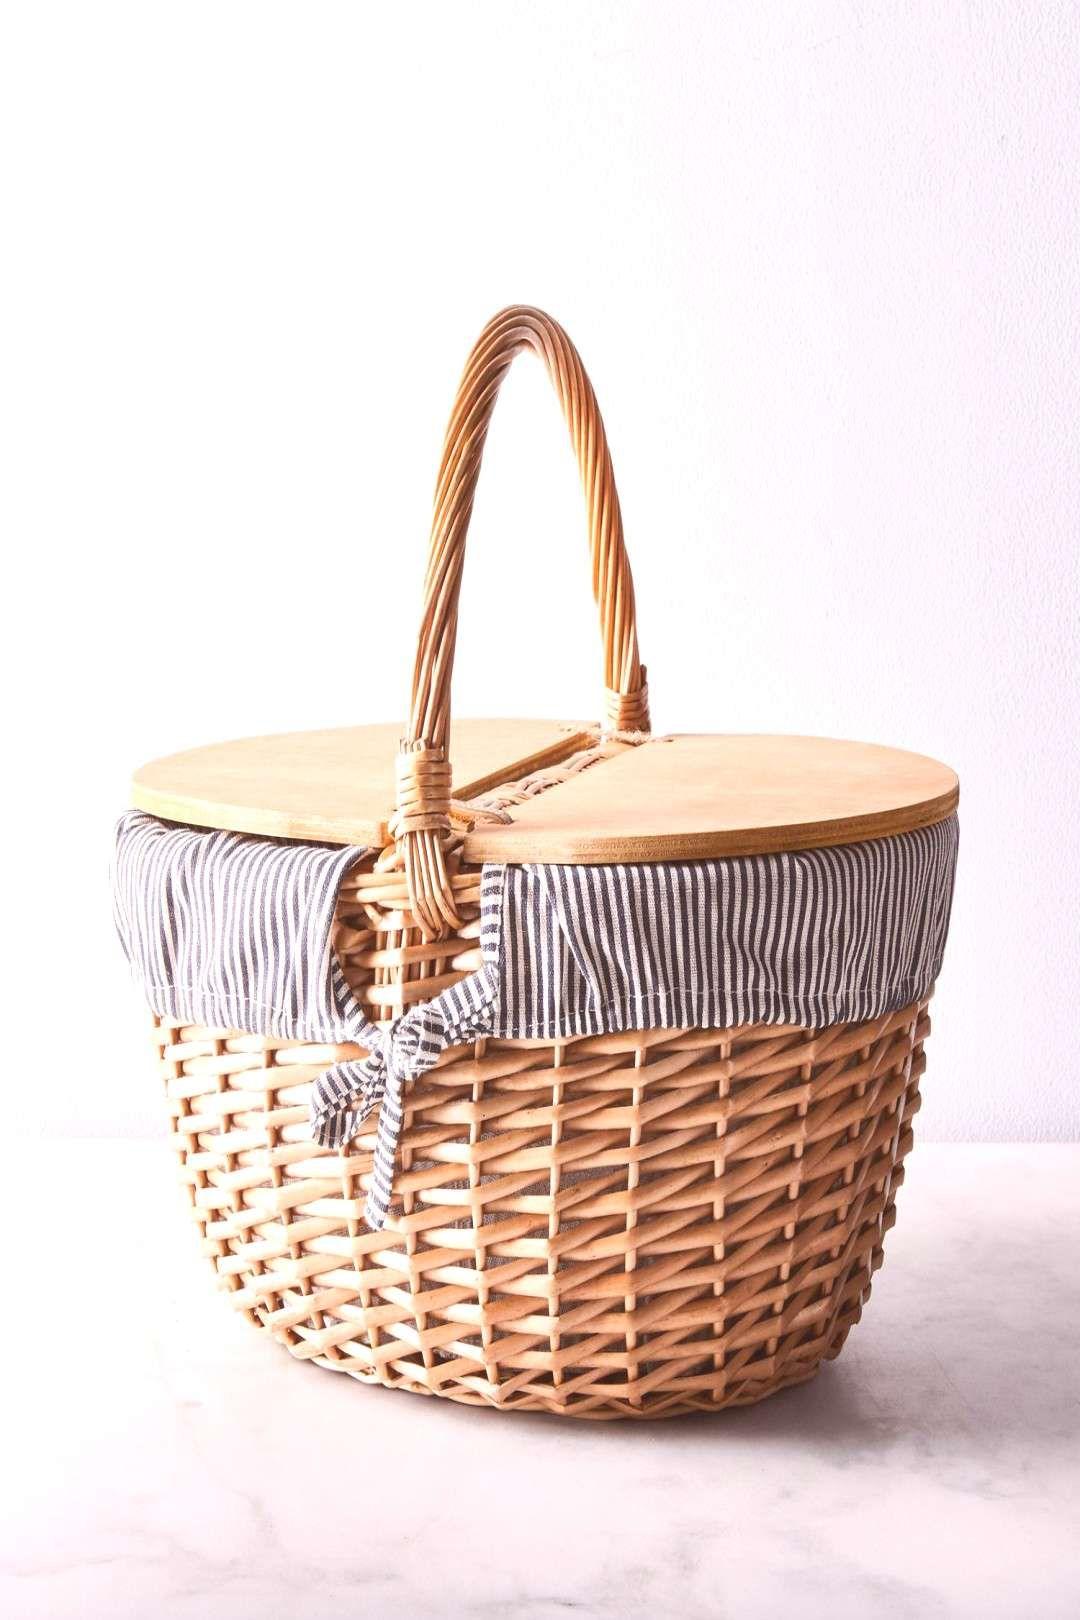 #stripe #picnic #basket #food52 #white #blue #on Blue ...